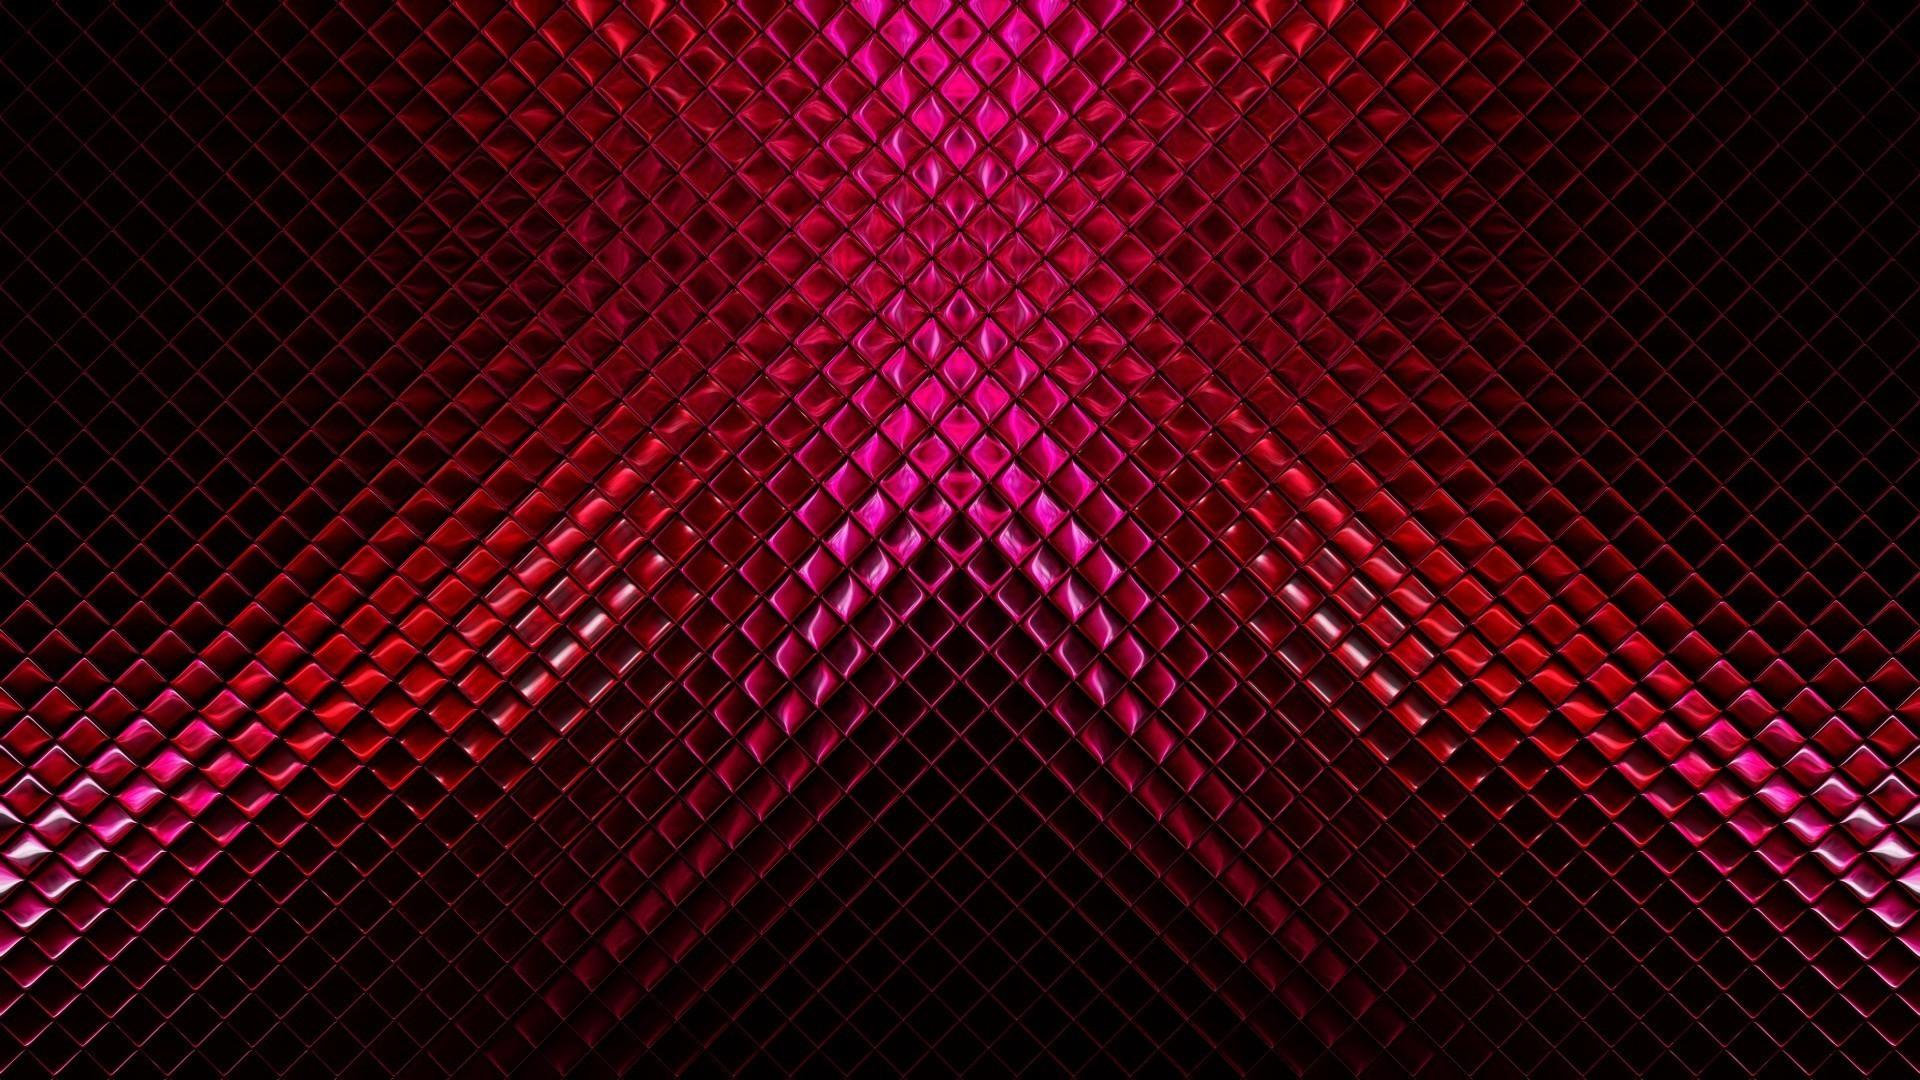 1280x800 Fall Hd Wallpaper Free Photo Abstract Metallic Background Metallic